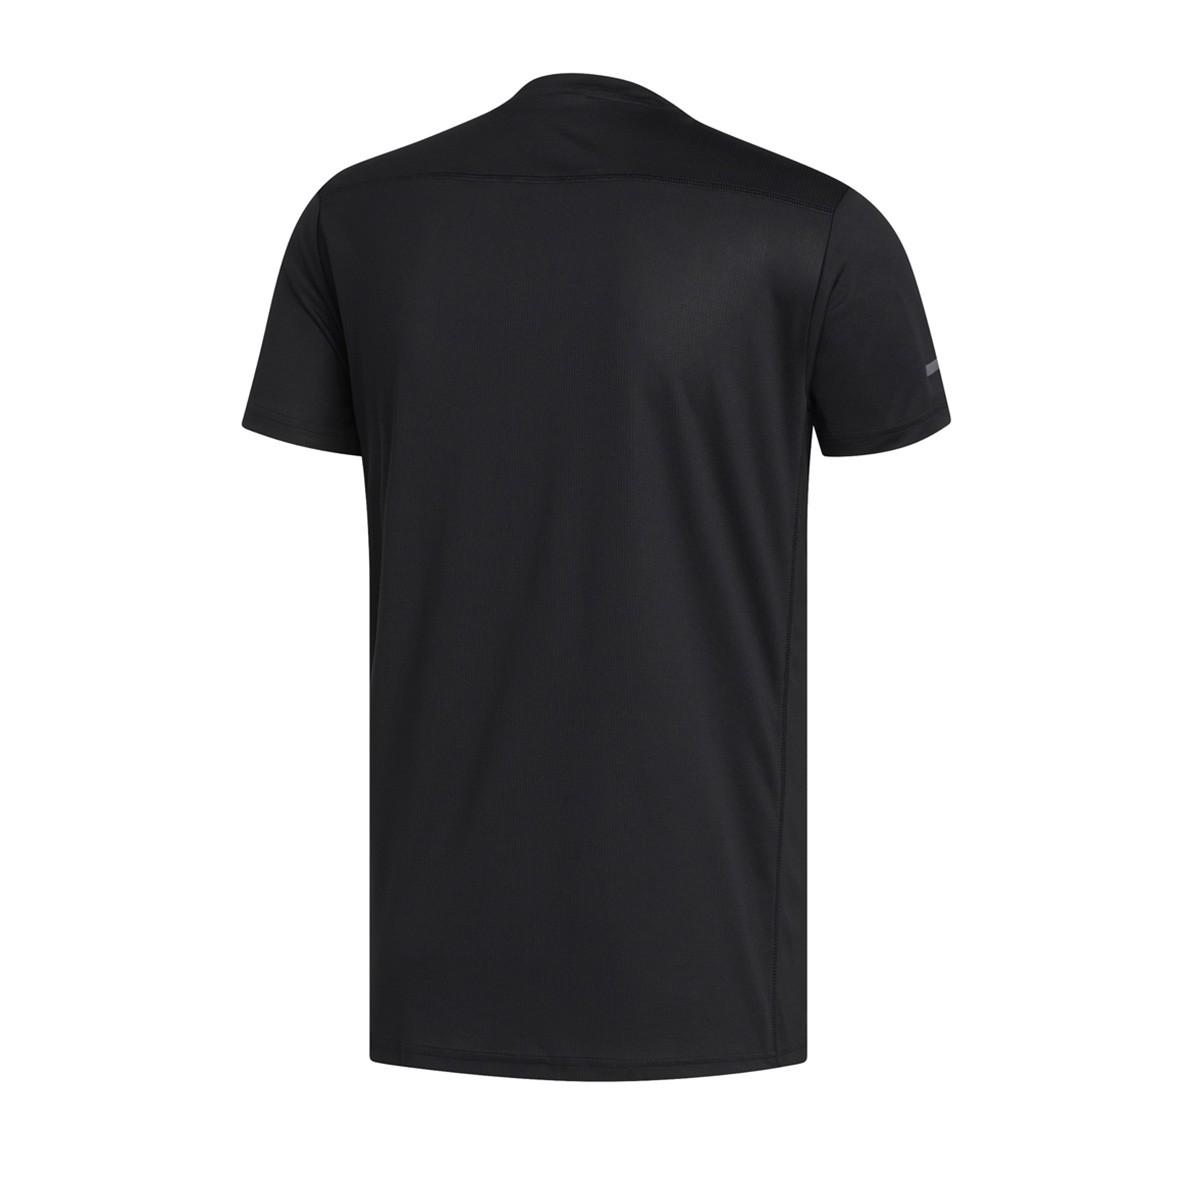 Camiseta Run It 3-Stripes Masculina